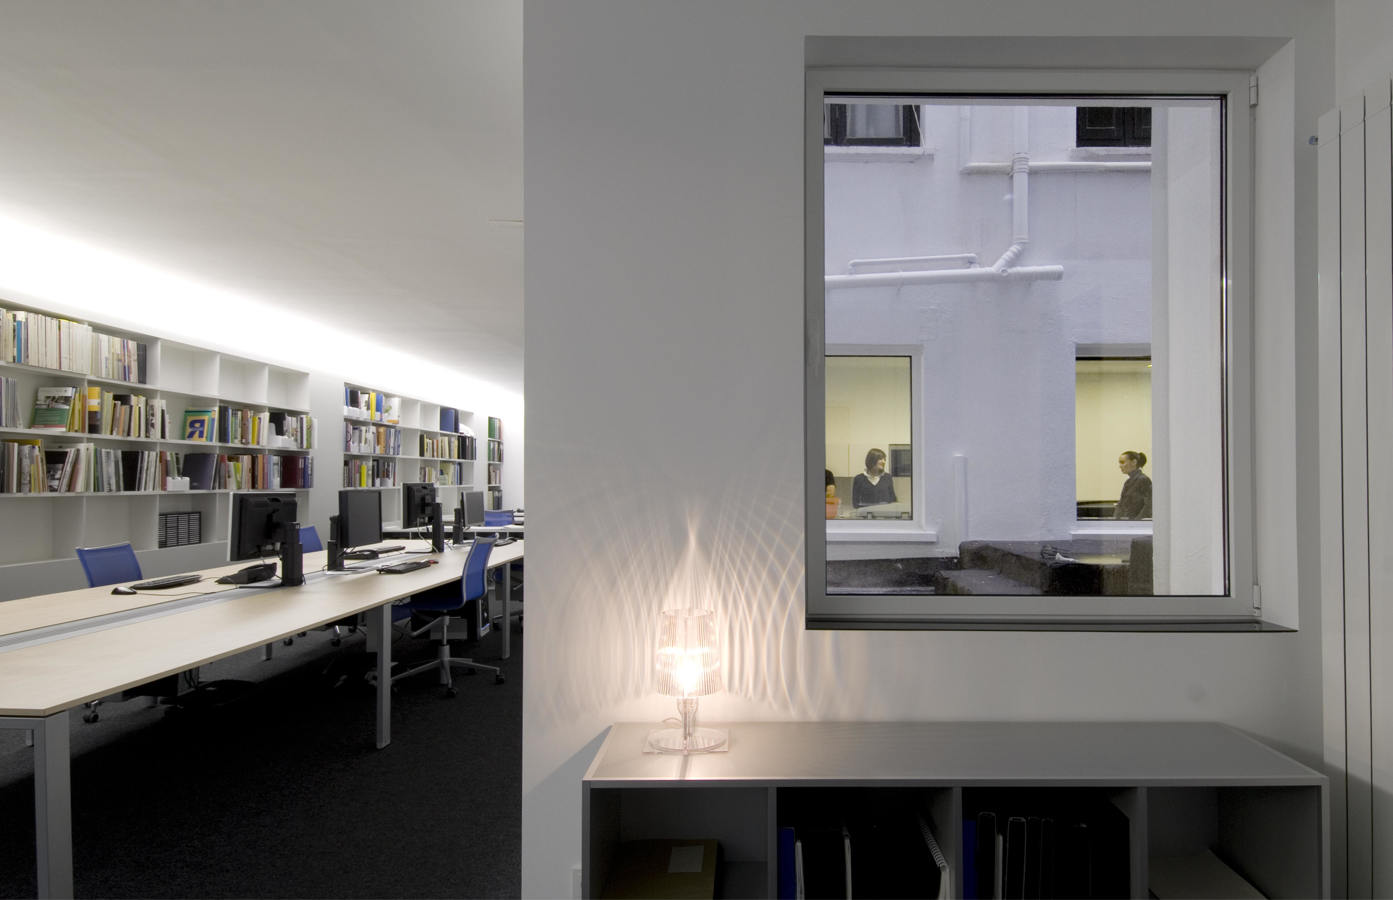 Foto estudio de arquitectura de patxi cortazar villaverde - Estudio arquitectura toledo ...